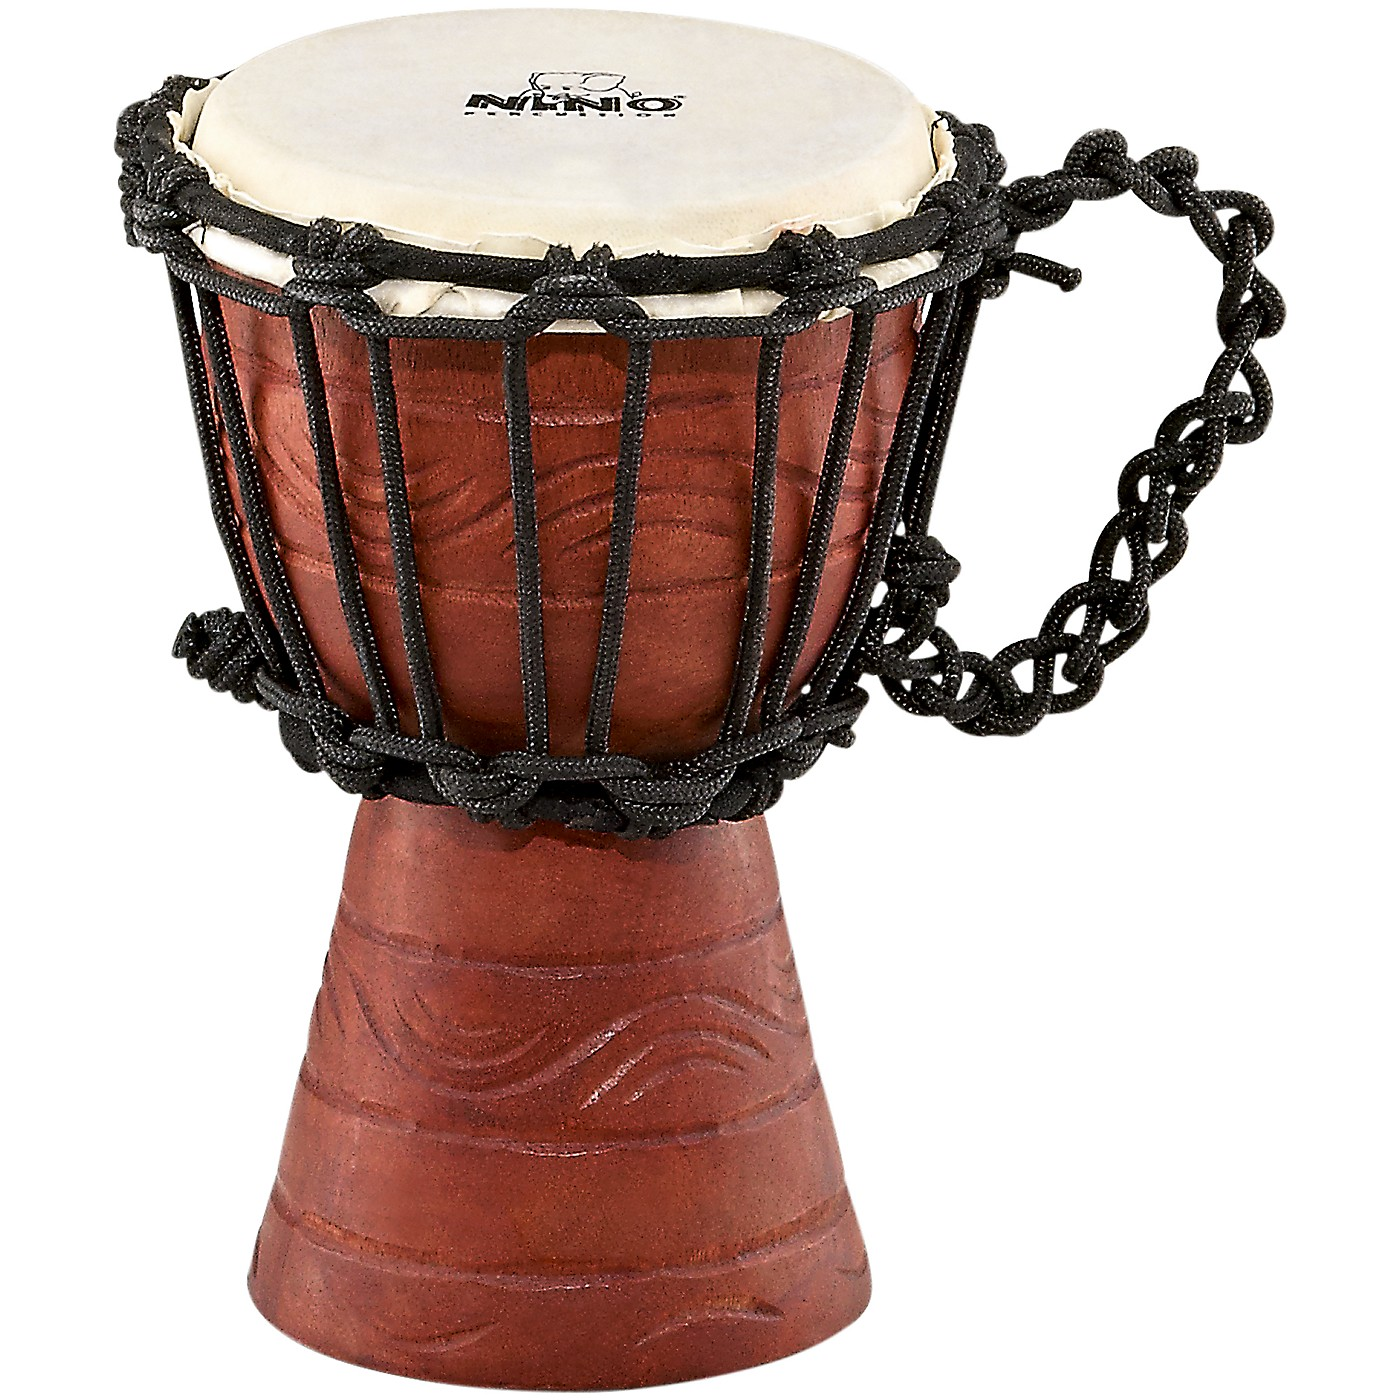 Nino Original African Style Rope-Tuned Water Rhythm Series Djembe thumbnail